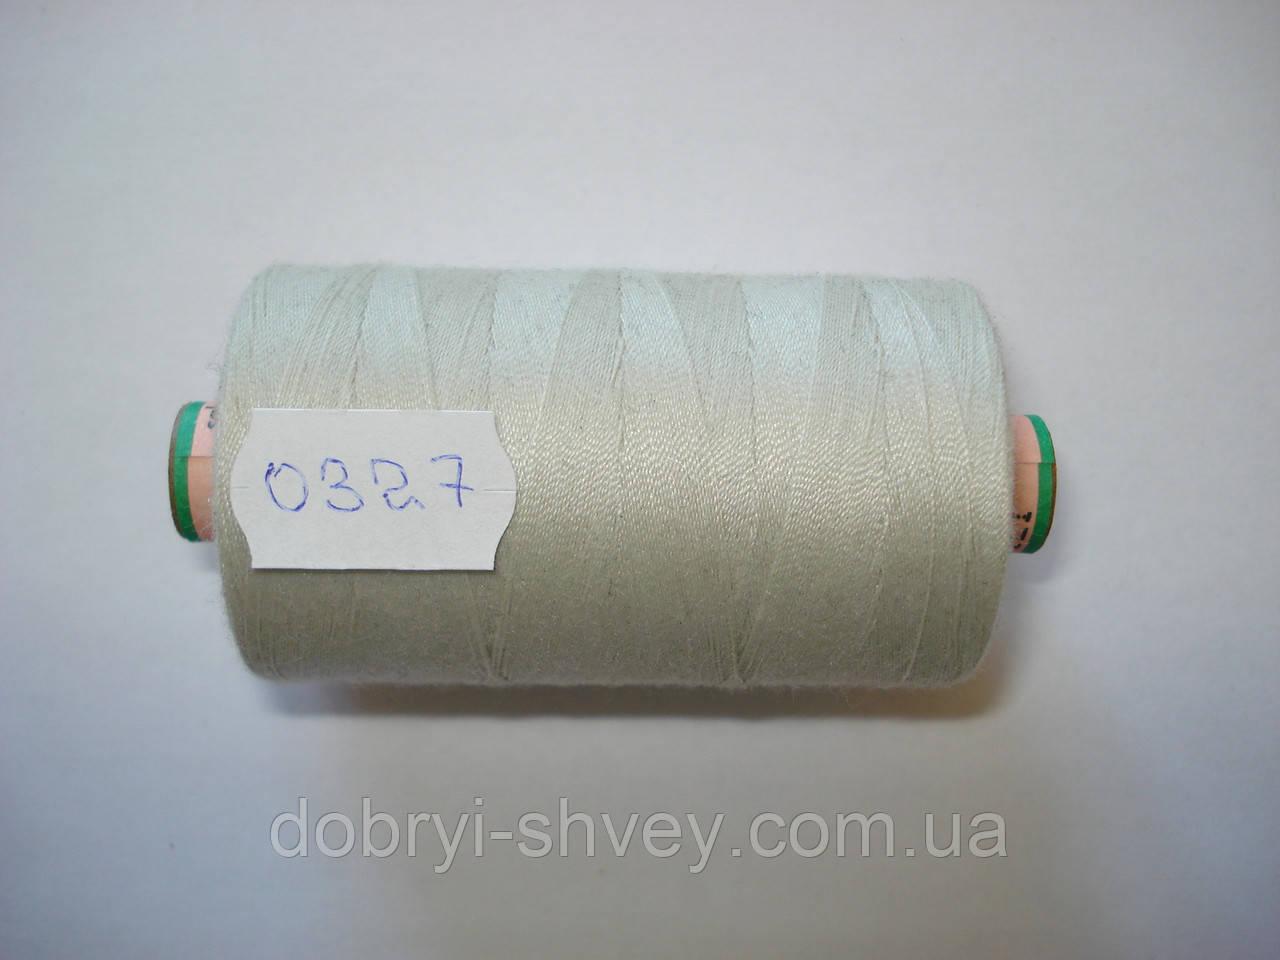 Нитка AMANN Saba c №80 1000м.col 0327 св.бежево-серый (шт.)